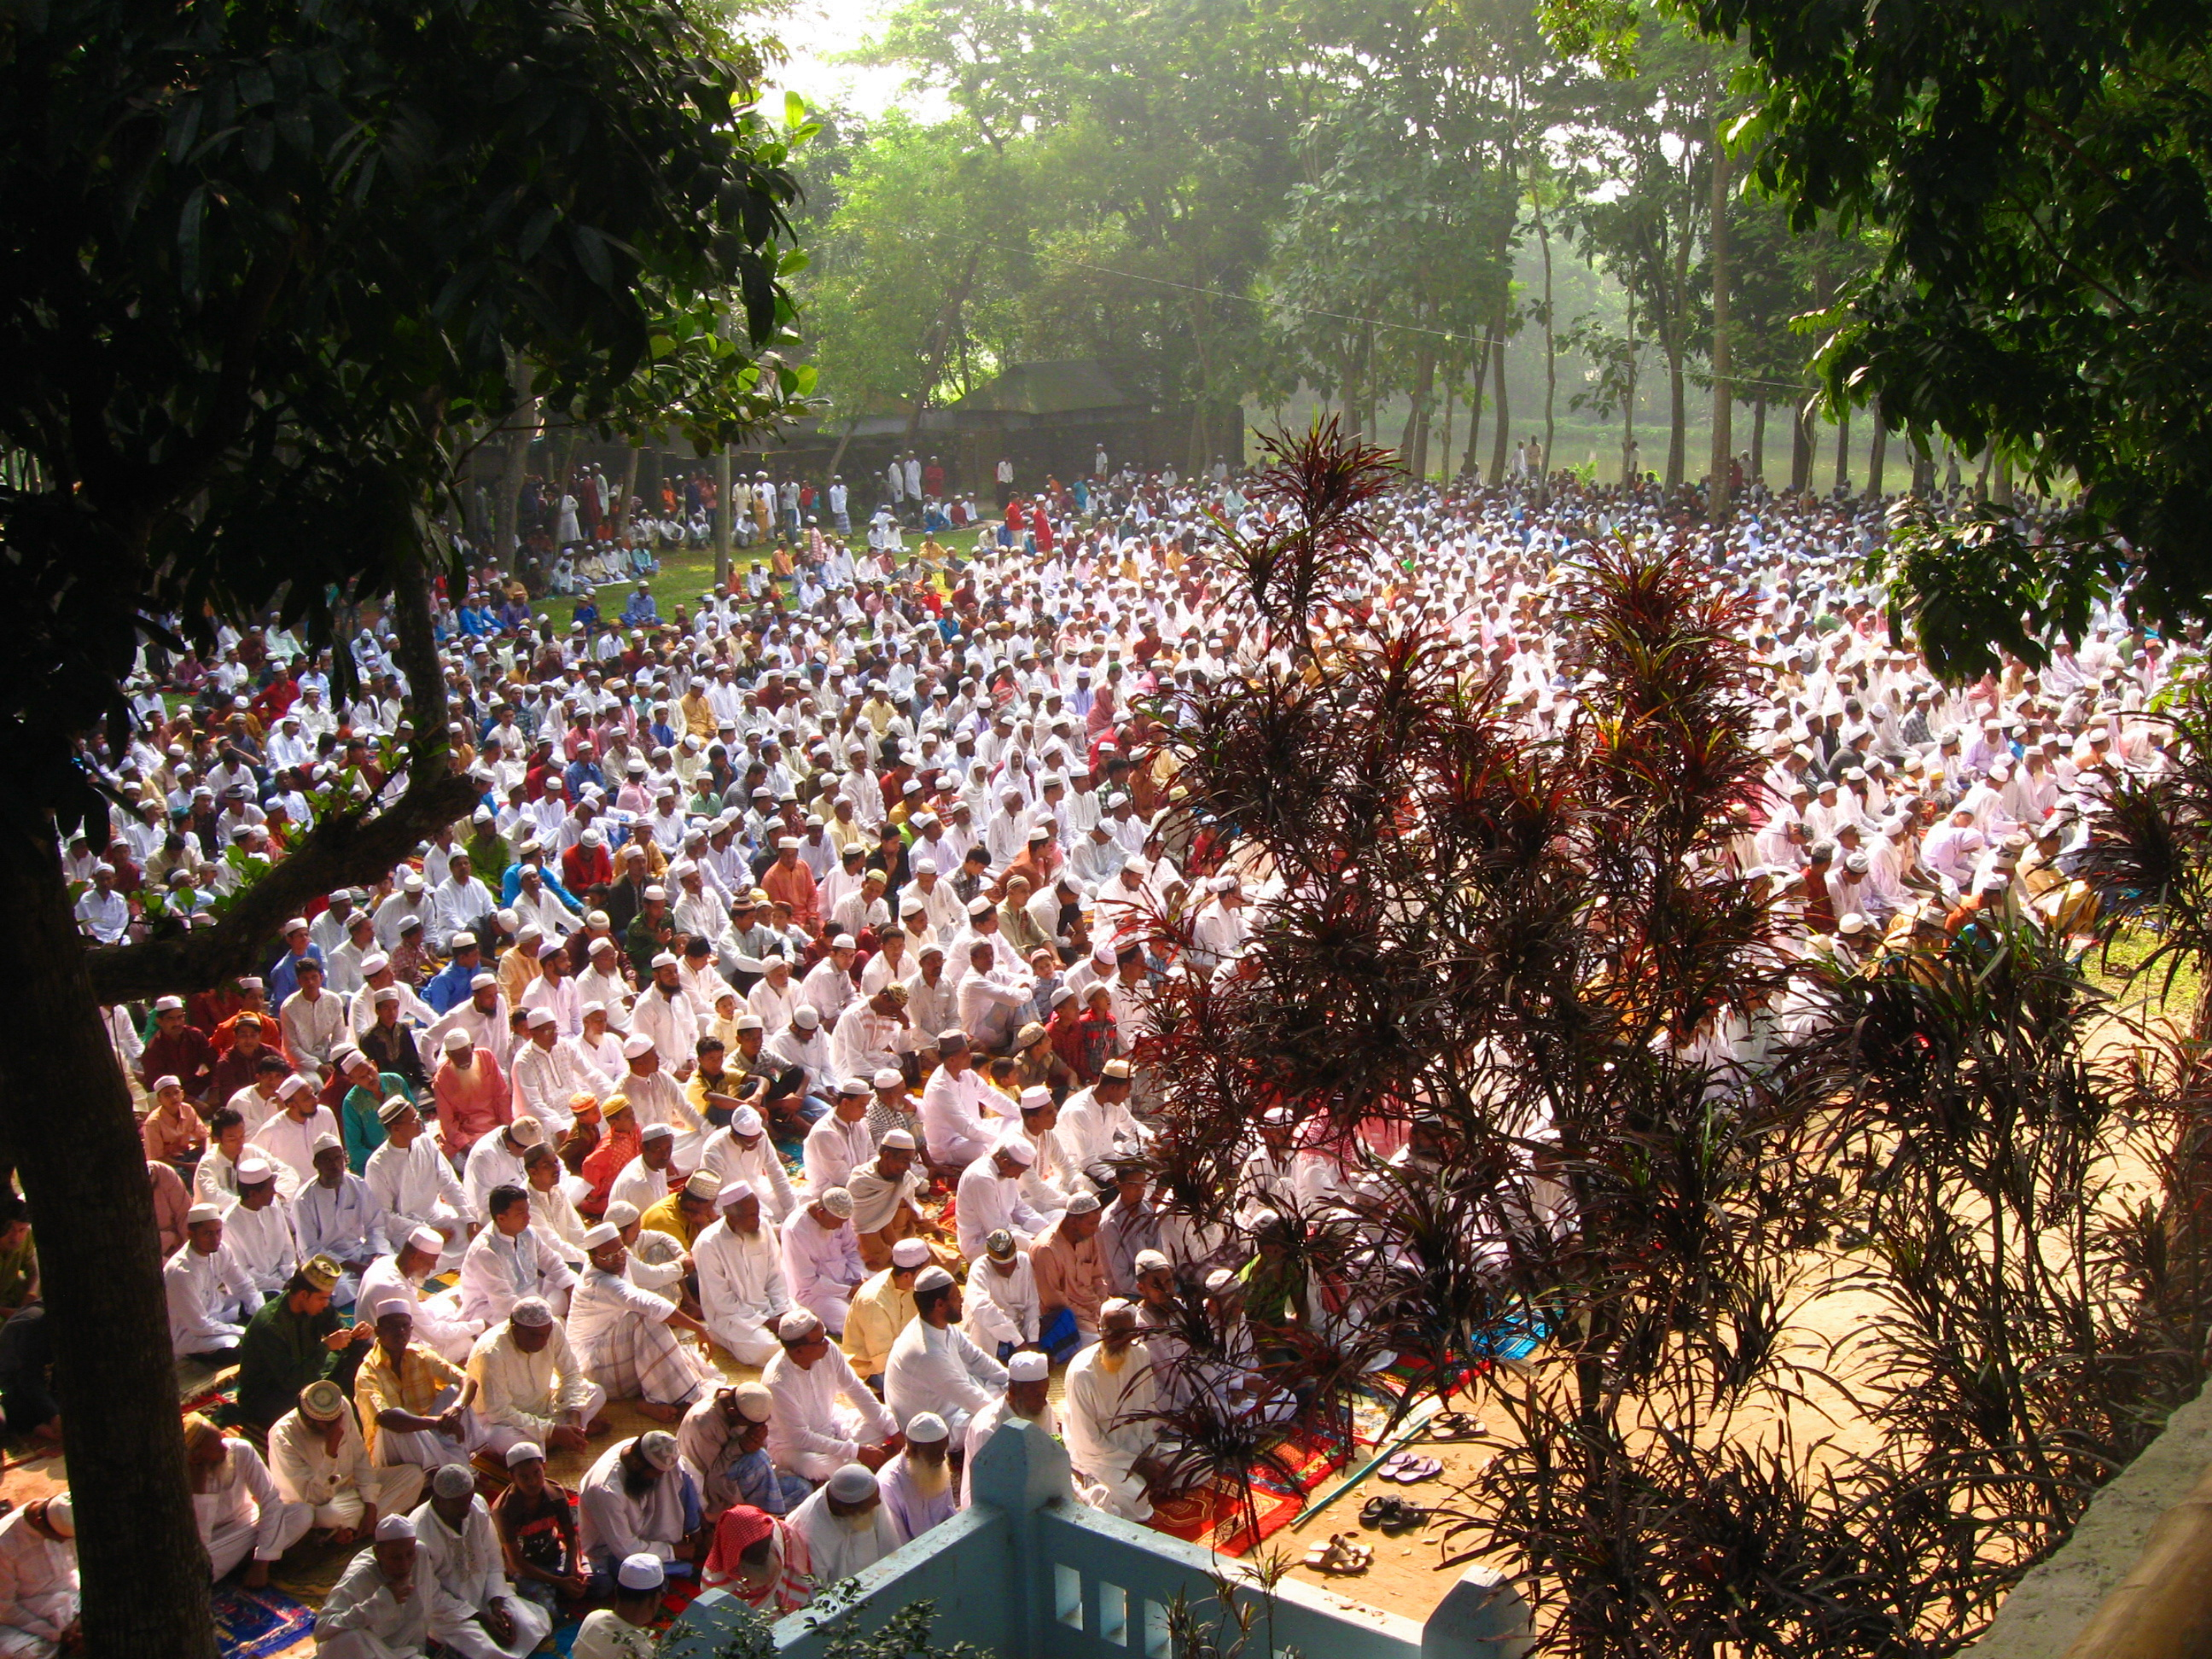 Eid_Prayers_at_Barashalghar,_Debidwar,_Comilla.jpg (2592×1944)